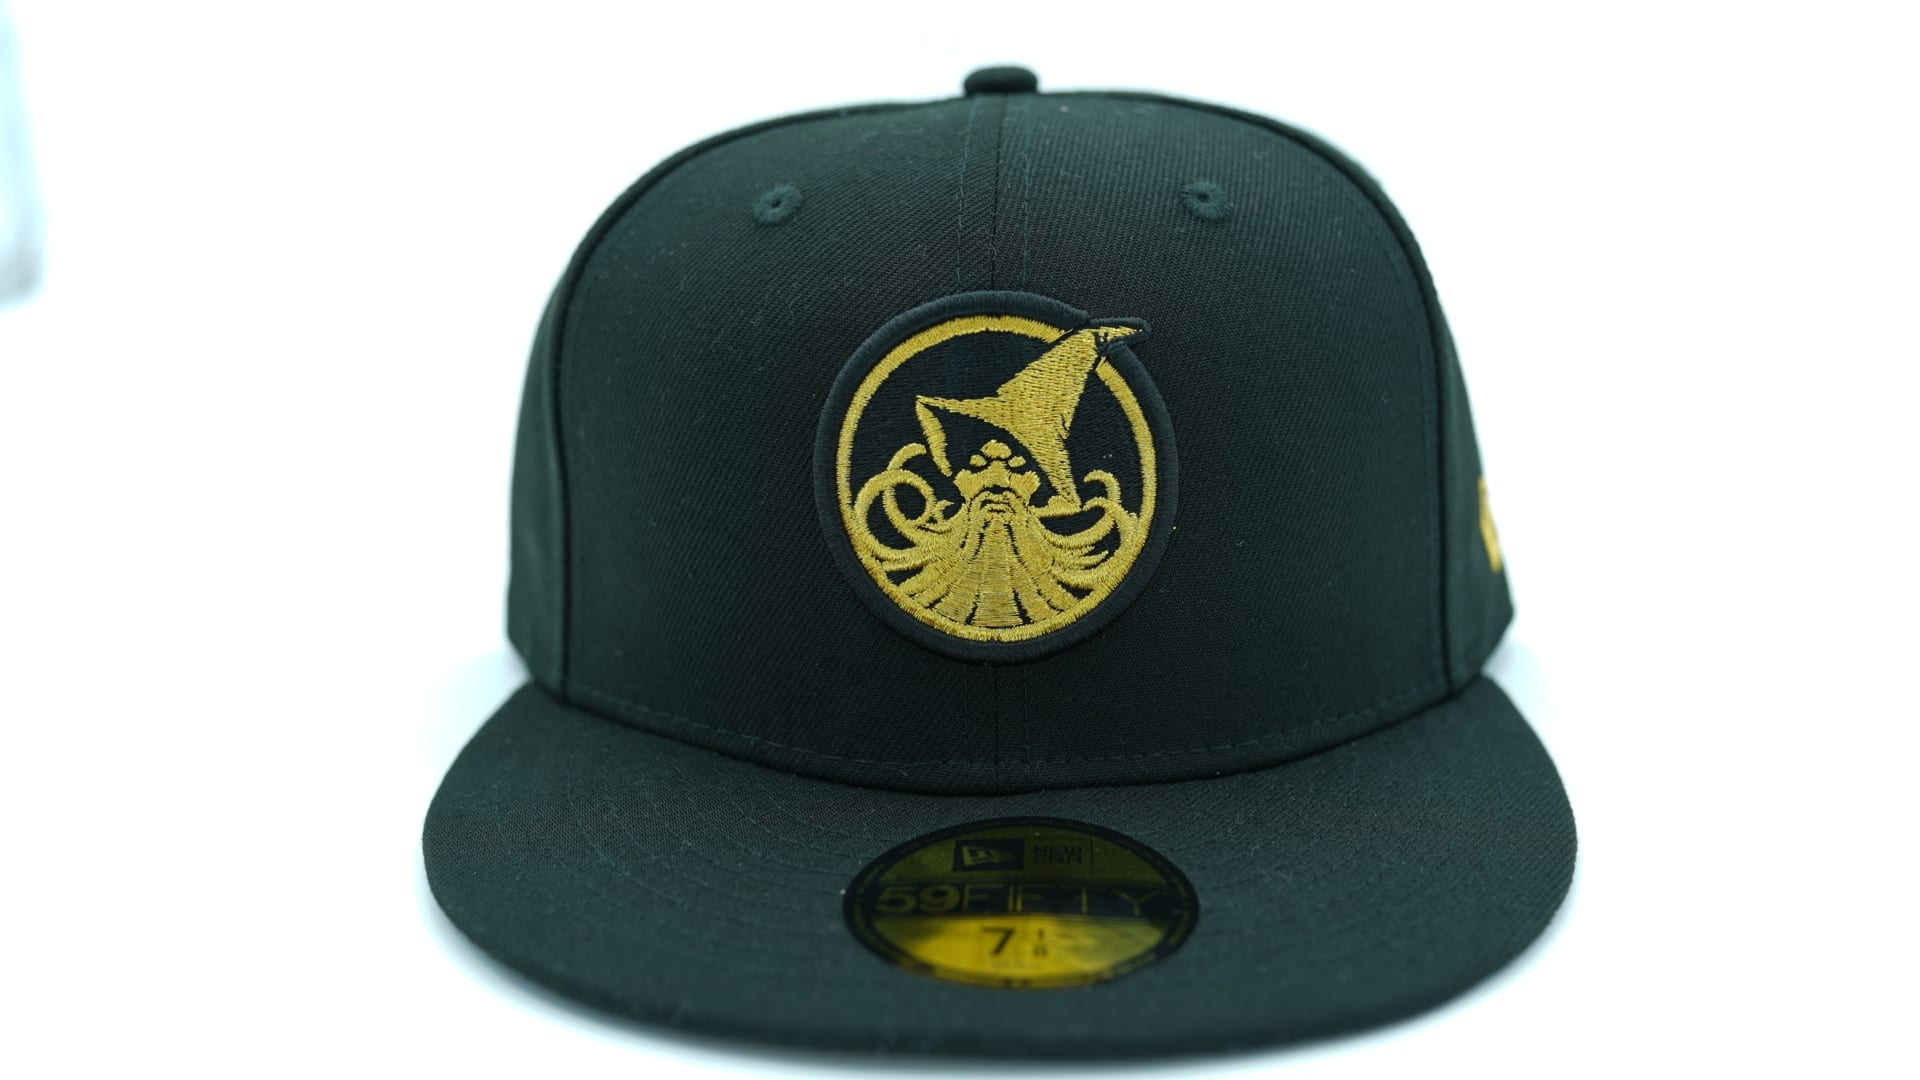 spaulding-philadelphia-style-fitted-cap.jpg